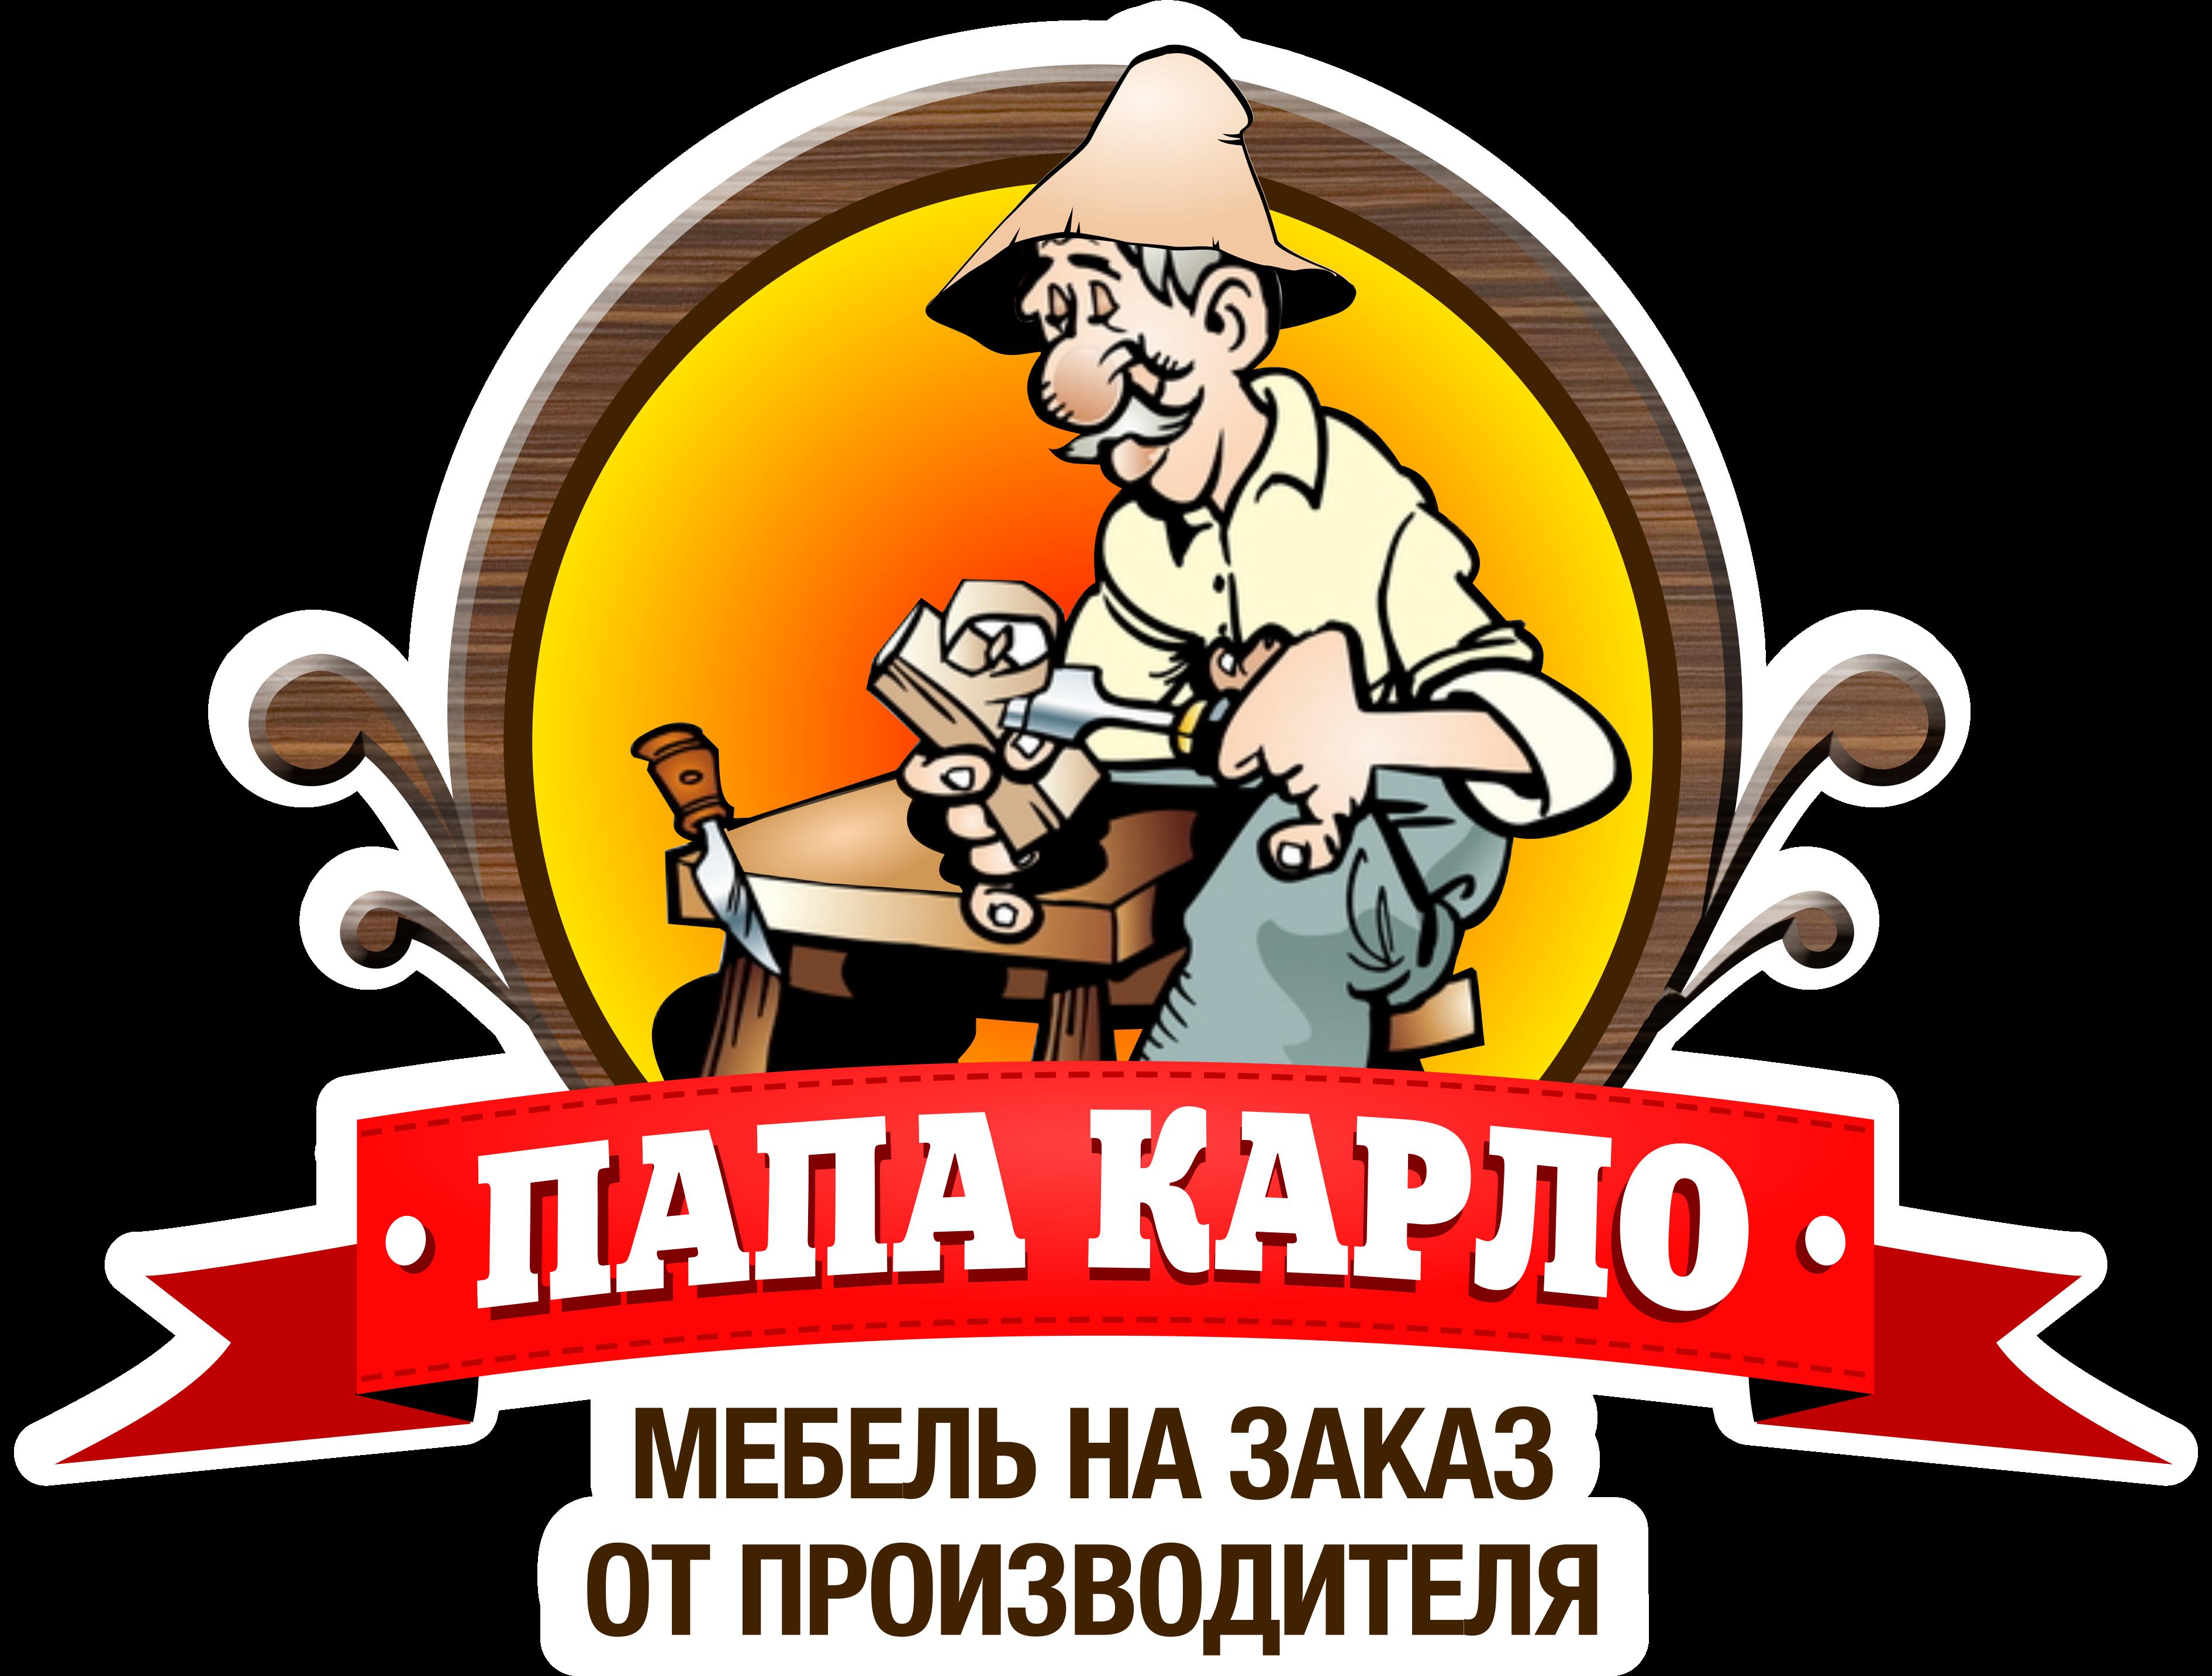 Картинка мастерская папы карло